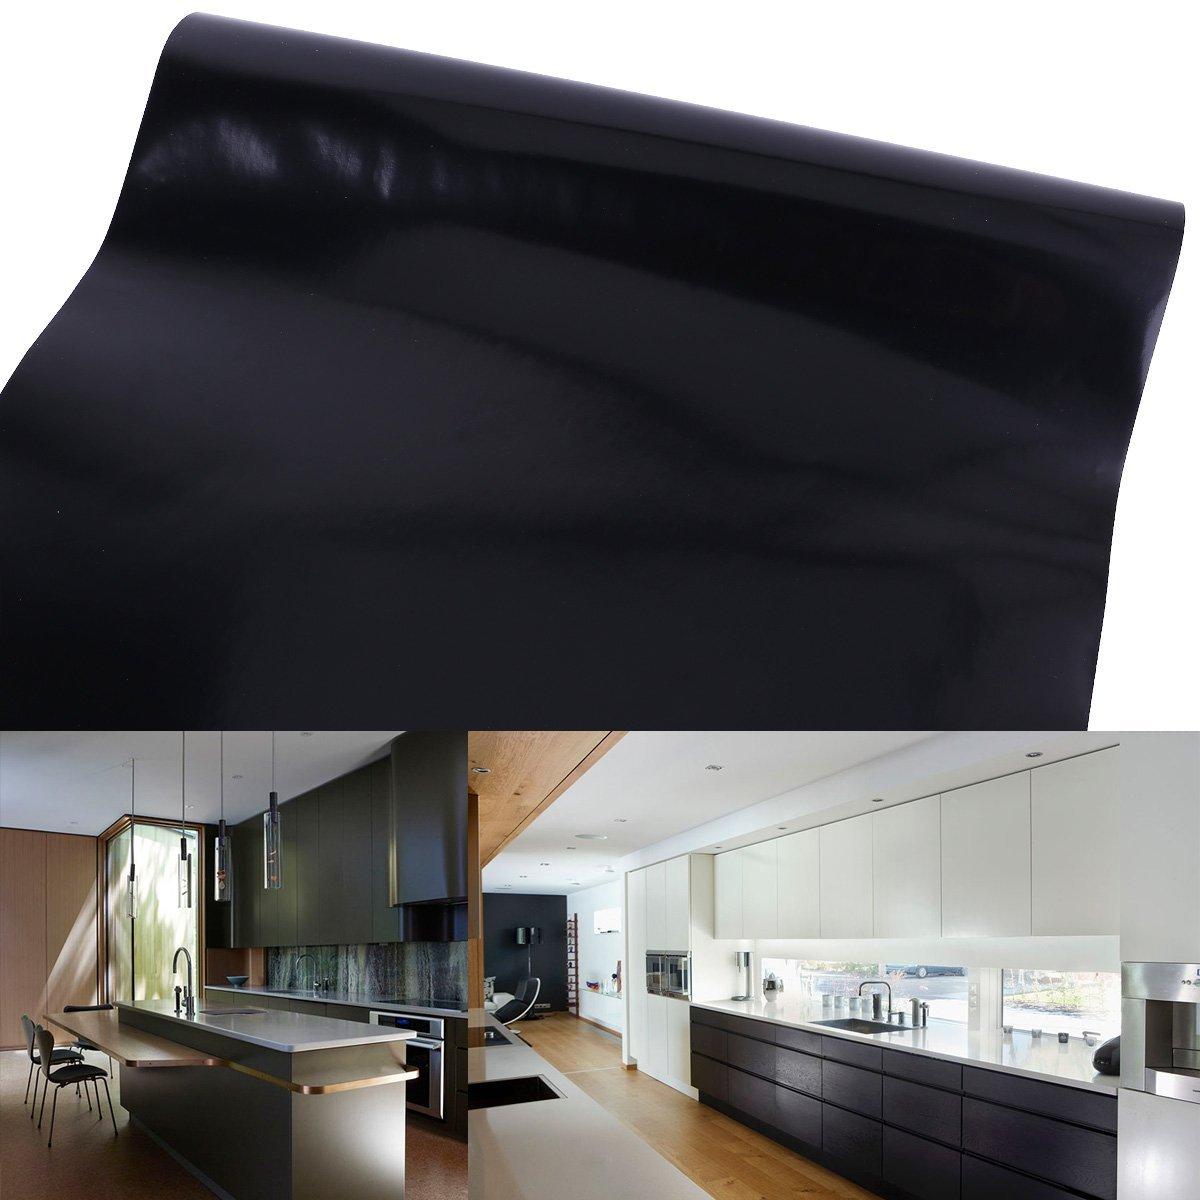 61 cm Rollo – 10 M (Metro) Negro auto-adhesivos Muebles pantalla para manualidades pantalla pantalla para plotter Armario pantalla decorativo pantalla pantalla: Amazon.es: Hogar